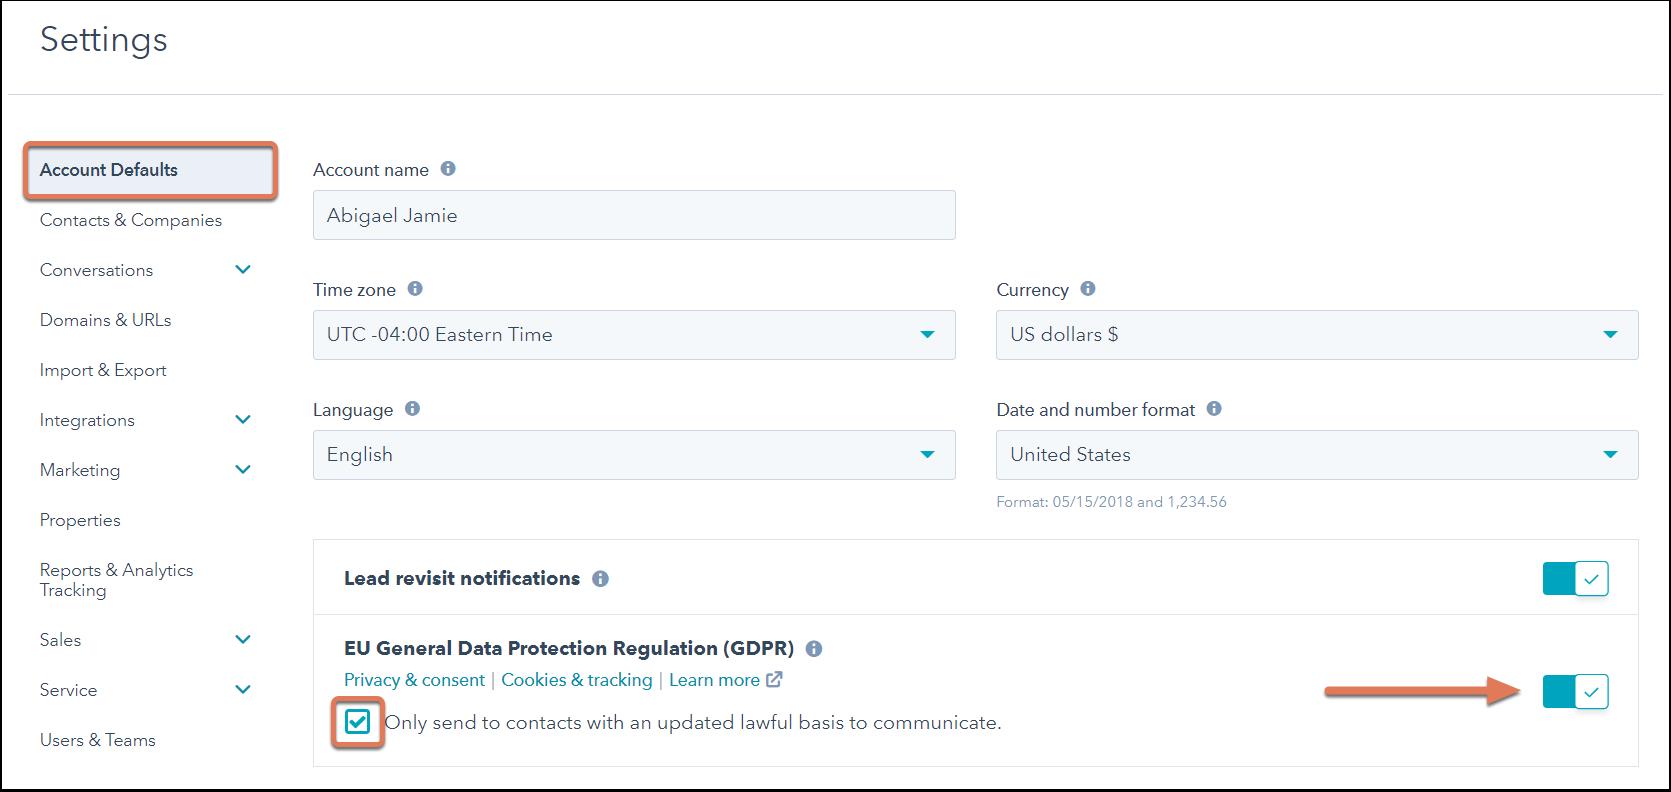 gdpr-settings-checkbox